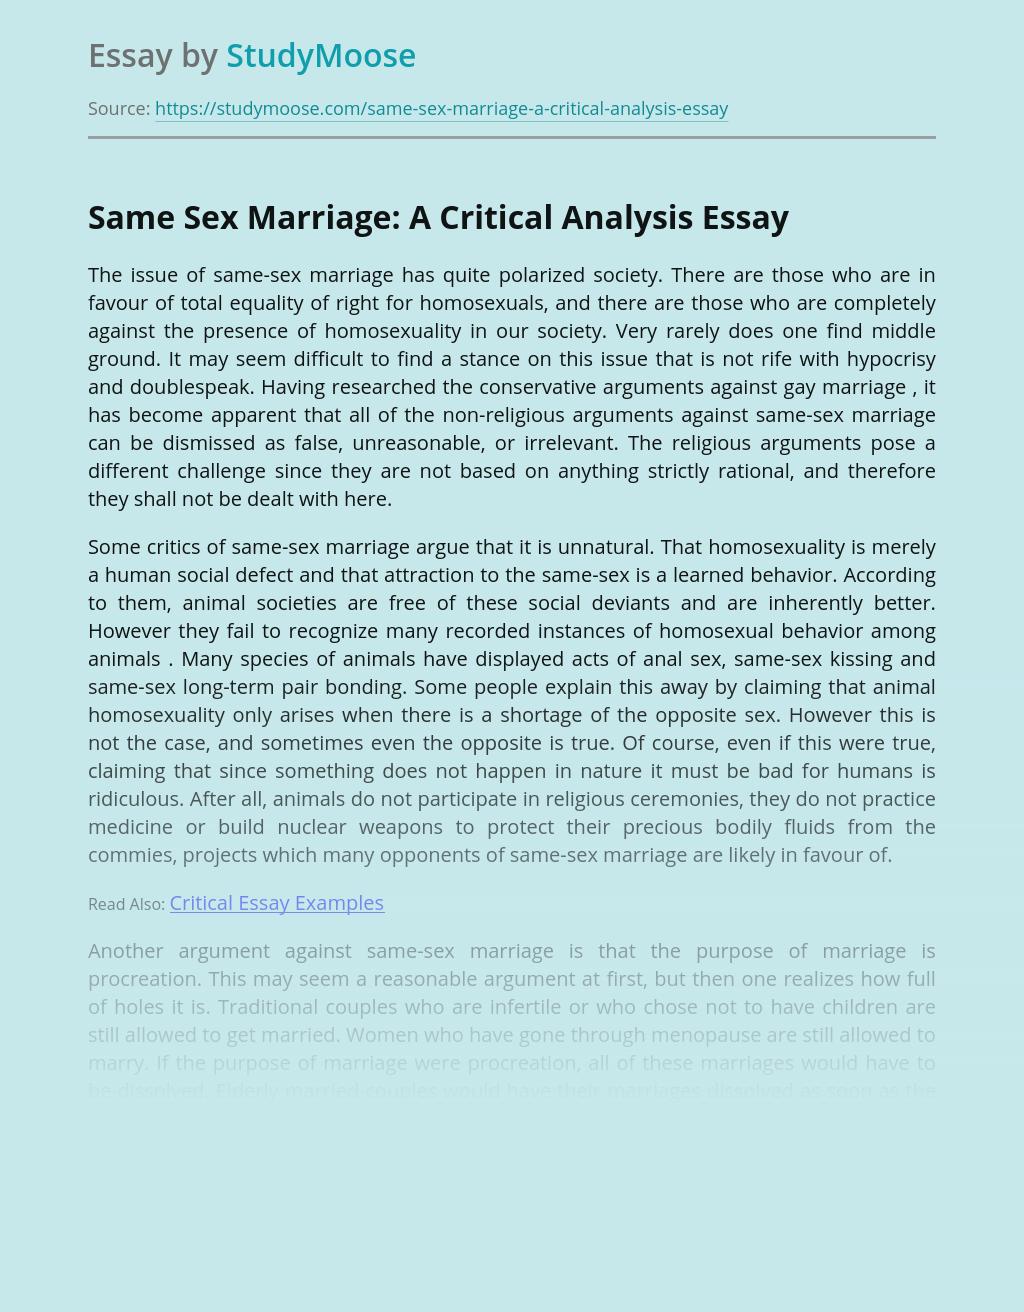 Same Sex Marriage: A Critical Analysis